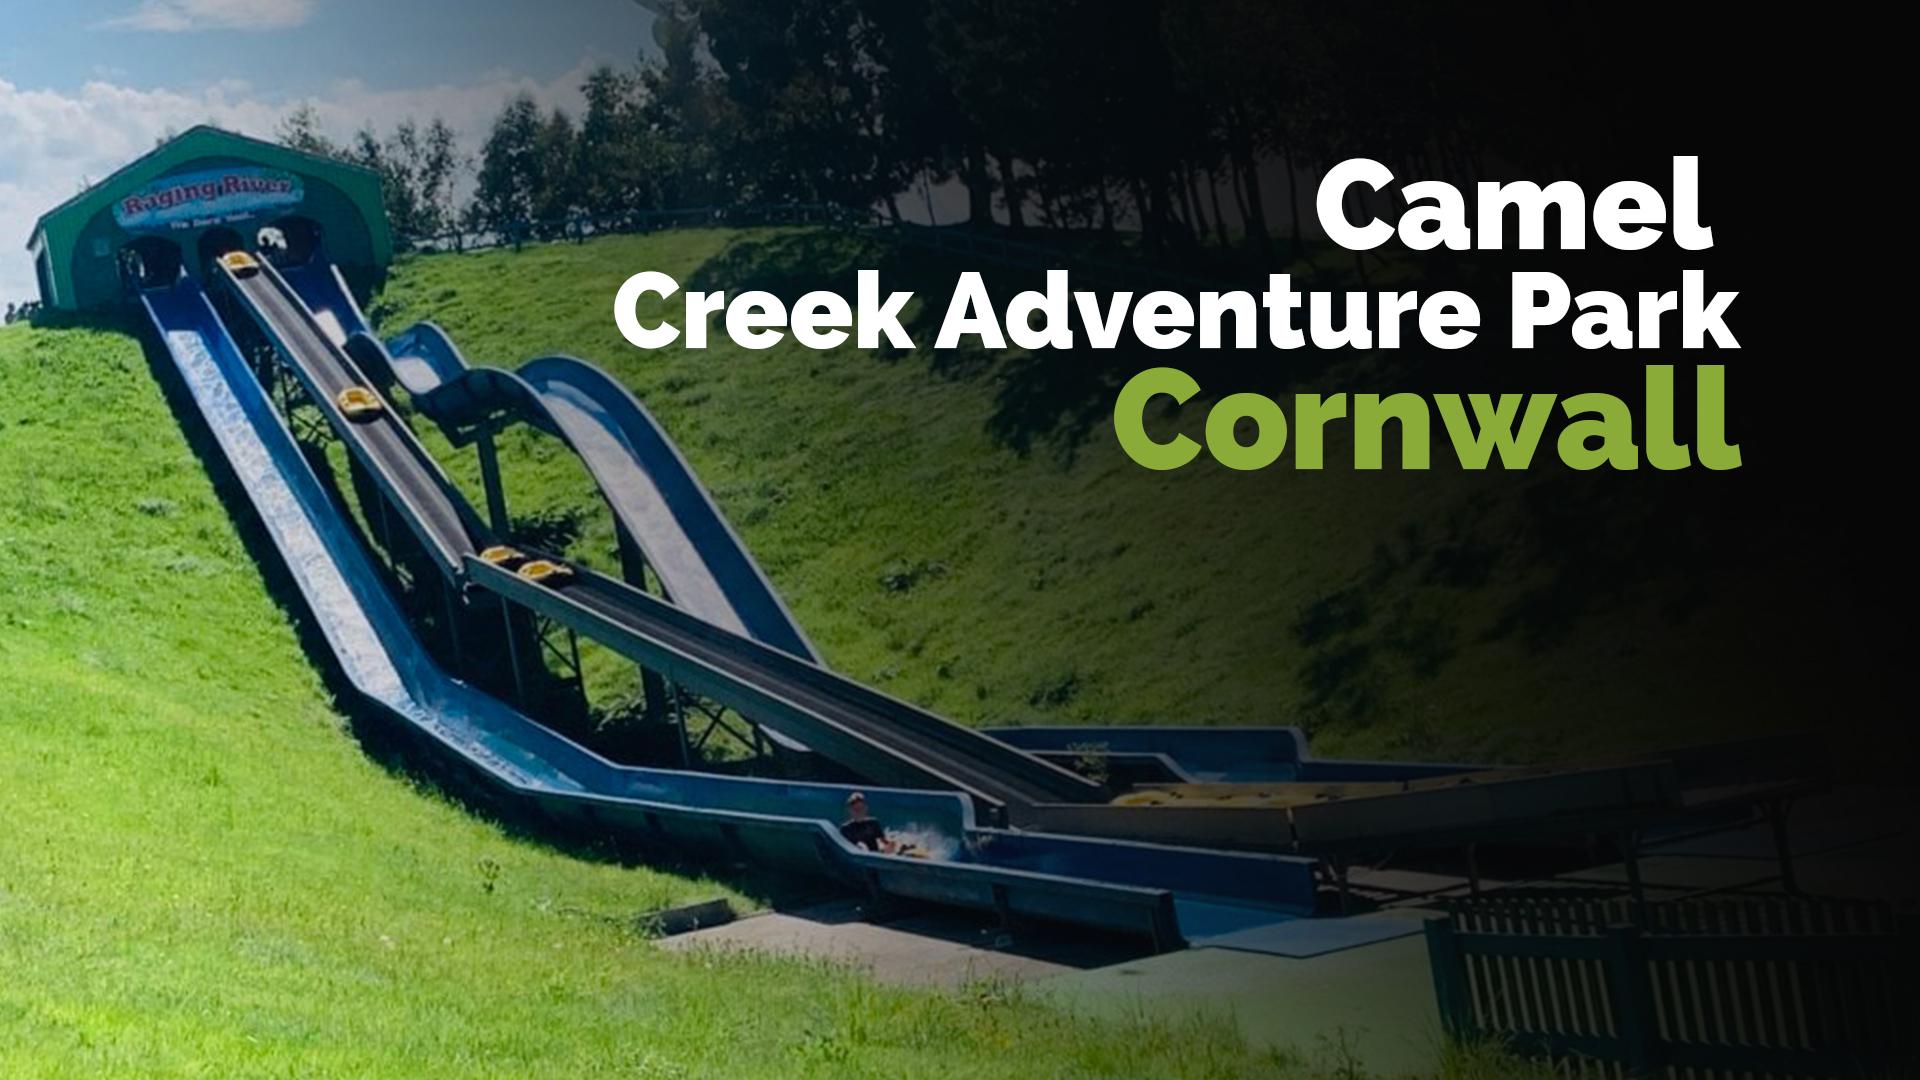 Camel Creek Adventure Park Cornwall